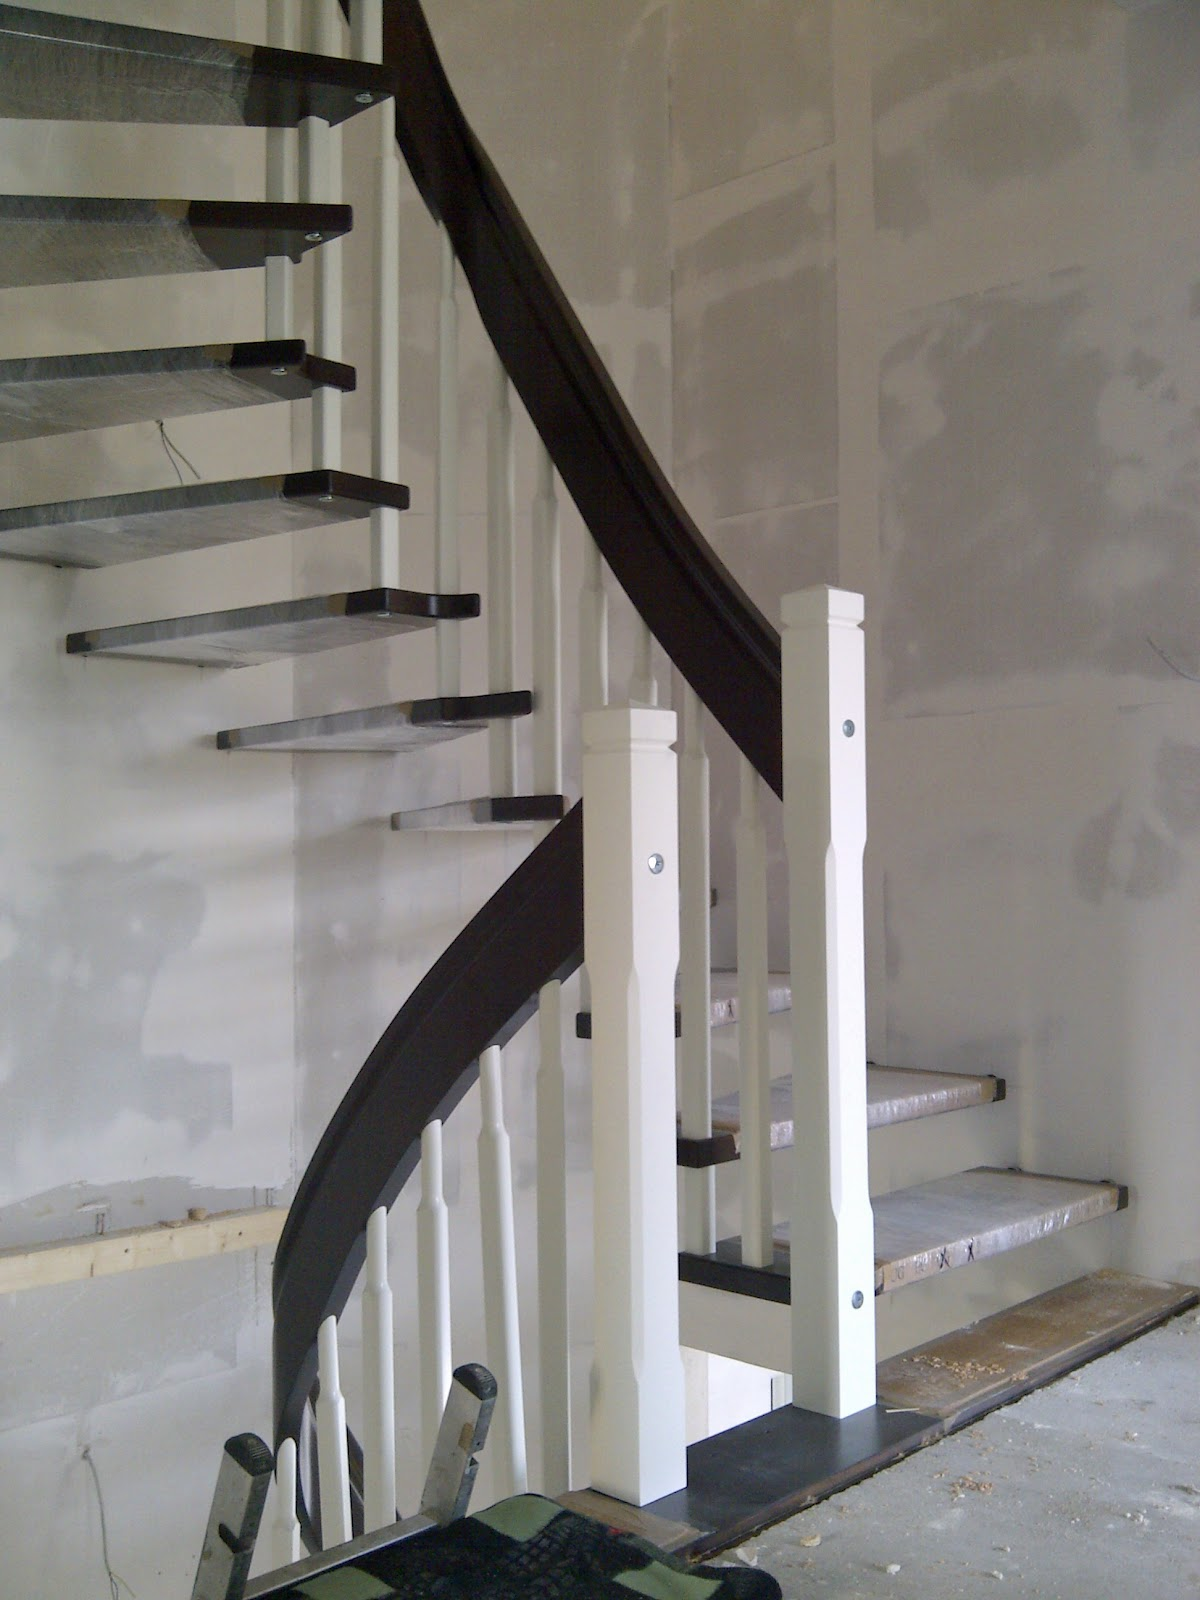 unser haus in waltrop tag 149 die treppe. Black Bedroom Furniture Sets. Home Design Ideas